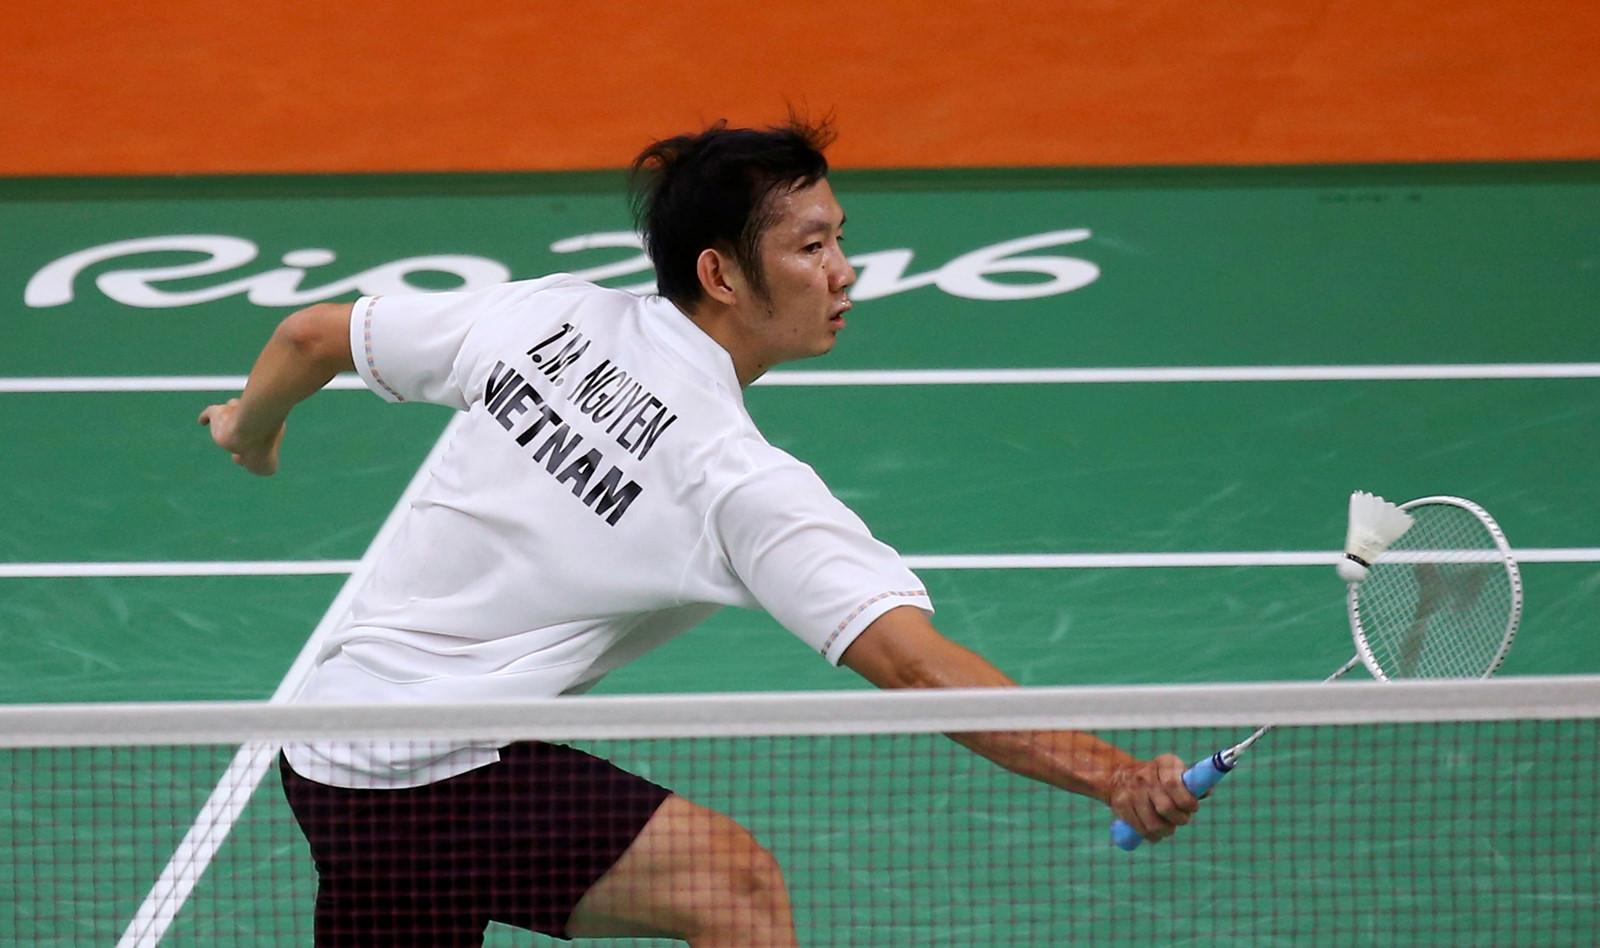 2016-08-13t005046z_590258654_rioec8d02ck3d_rtrmadp_3_olympics-rio-badminton-m-singles_SYEH